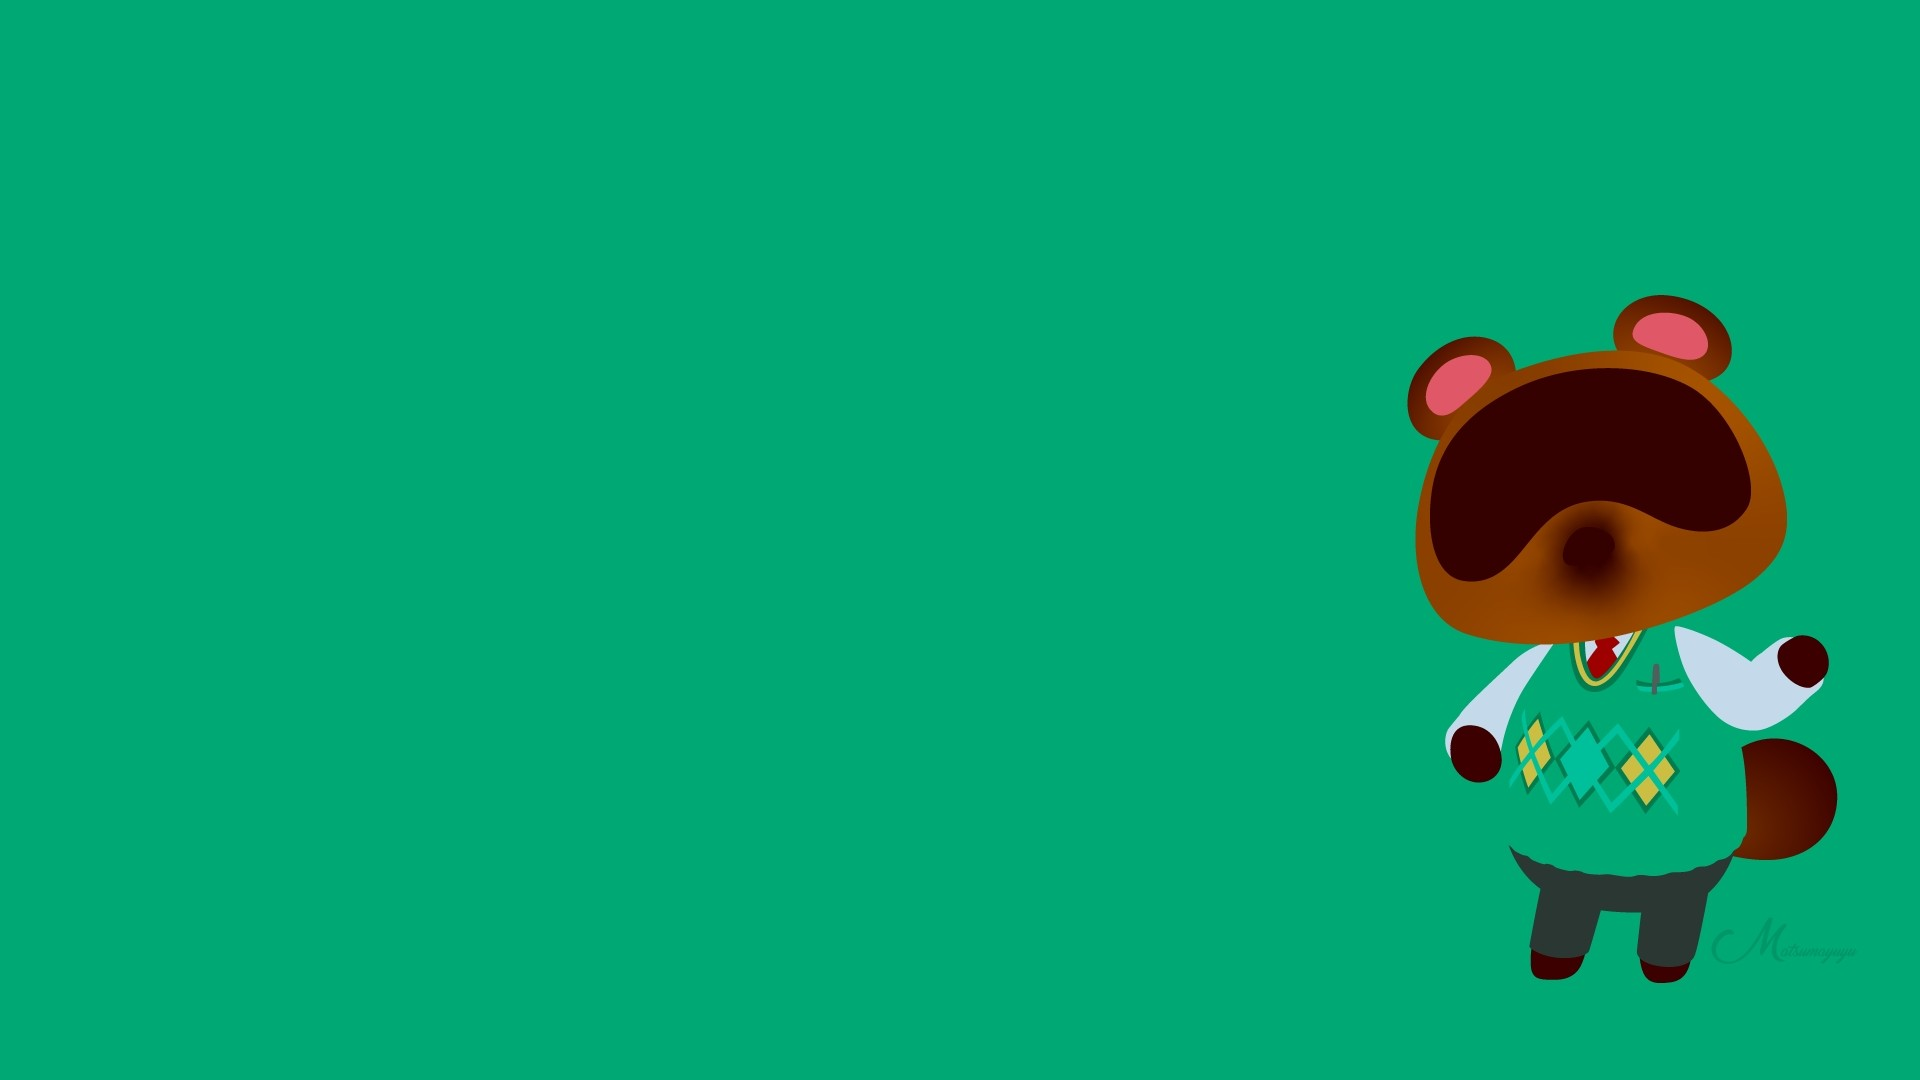 Animal Crossing Wallpaper image hd